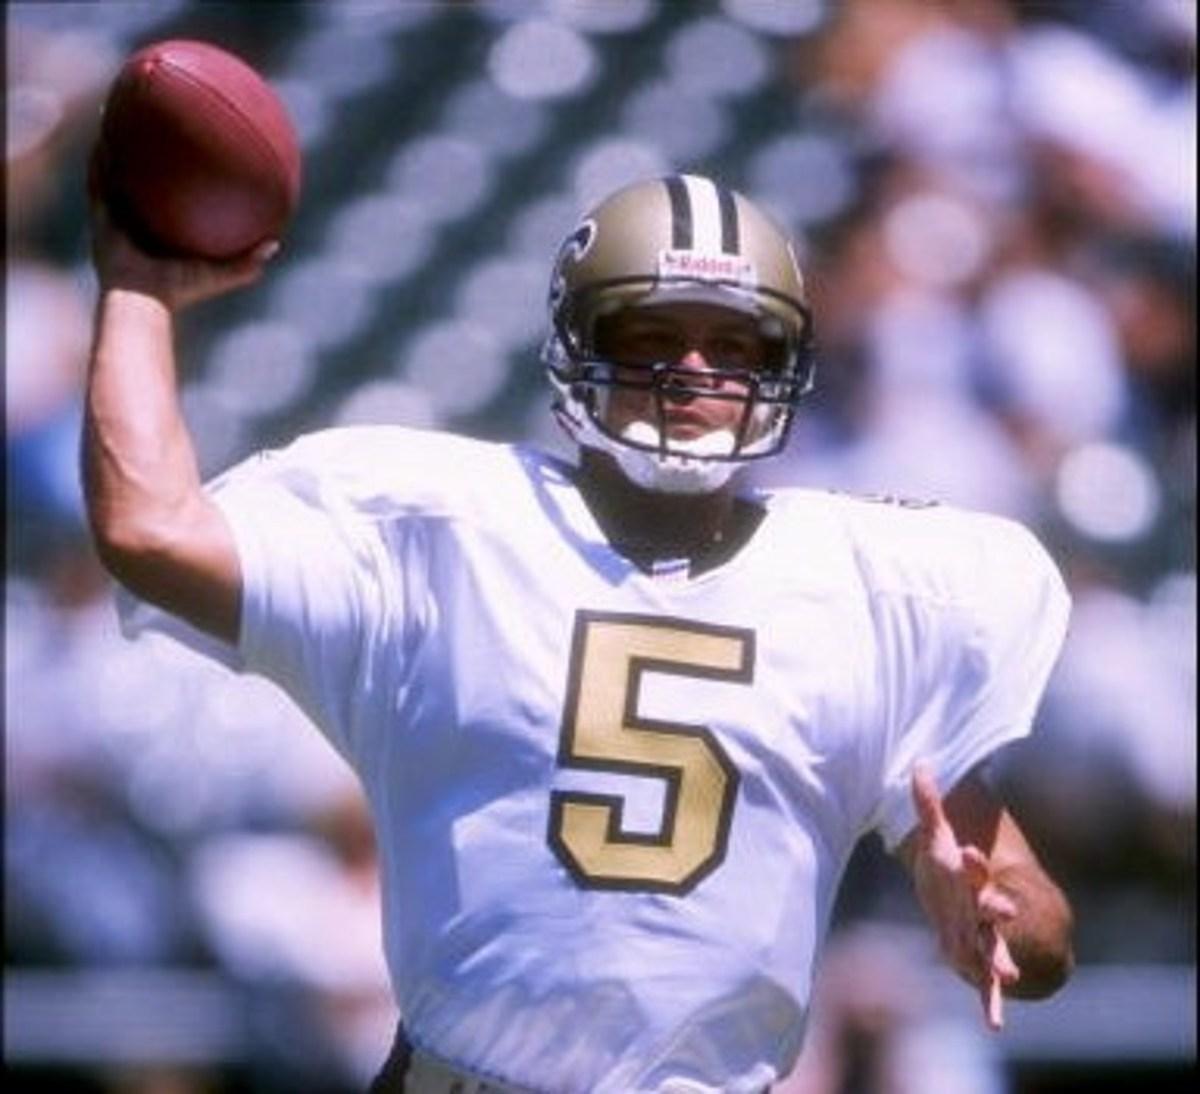 Former New Orleans Saints quarterback Heath Shuler. Credit: 973thedawg.com